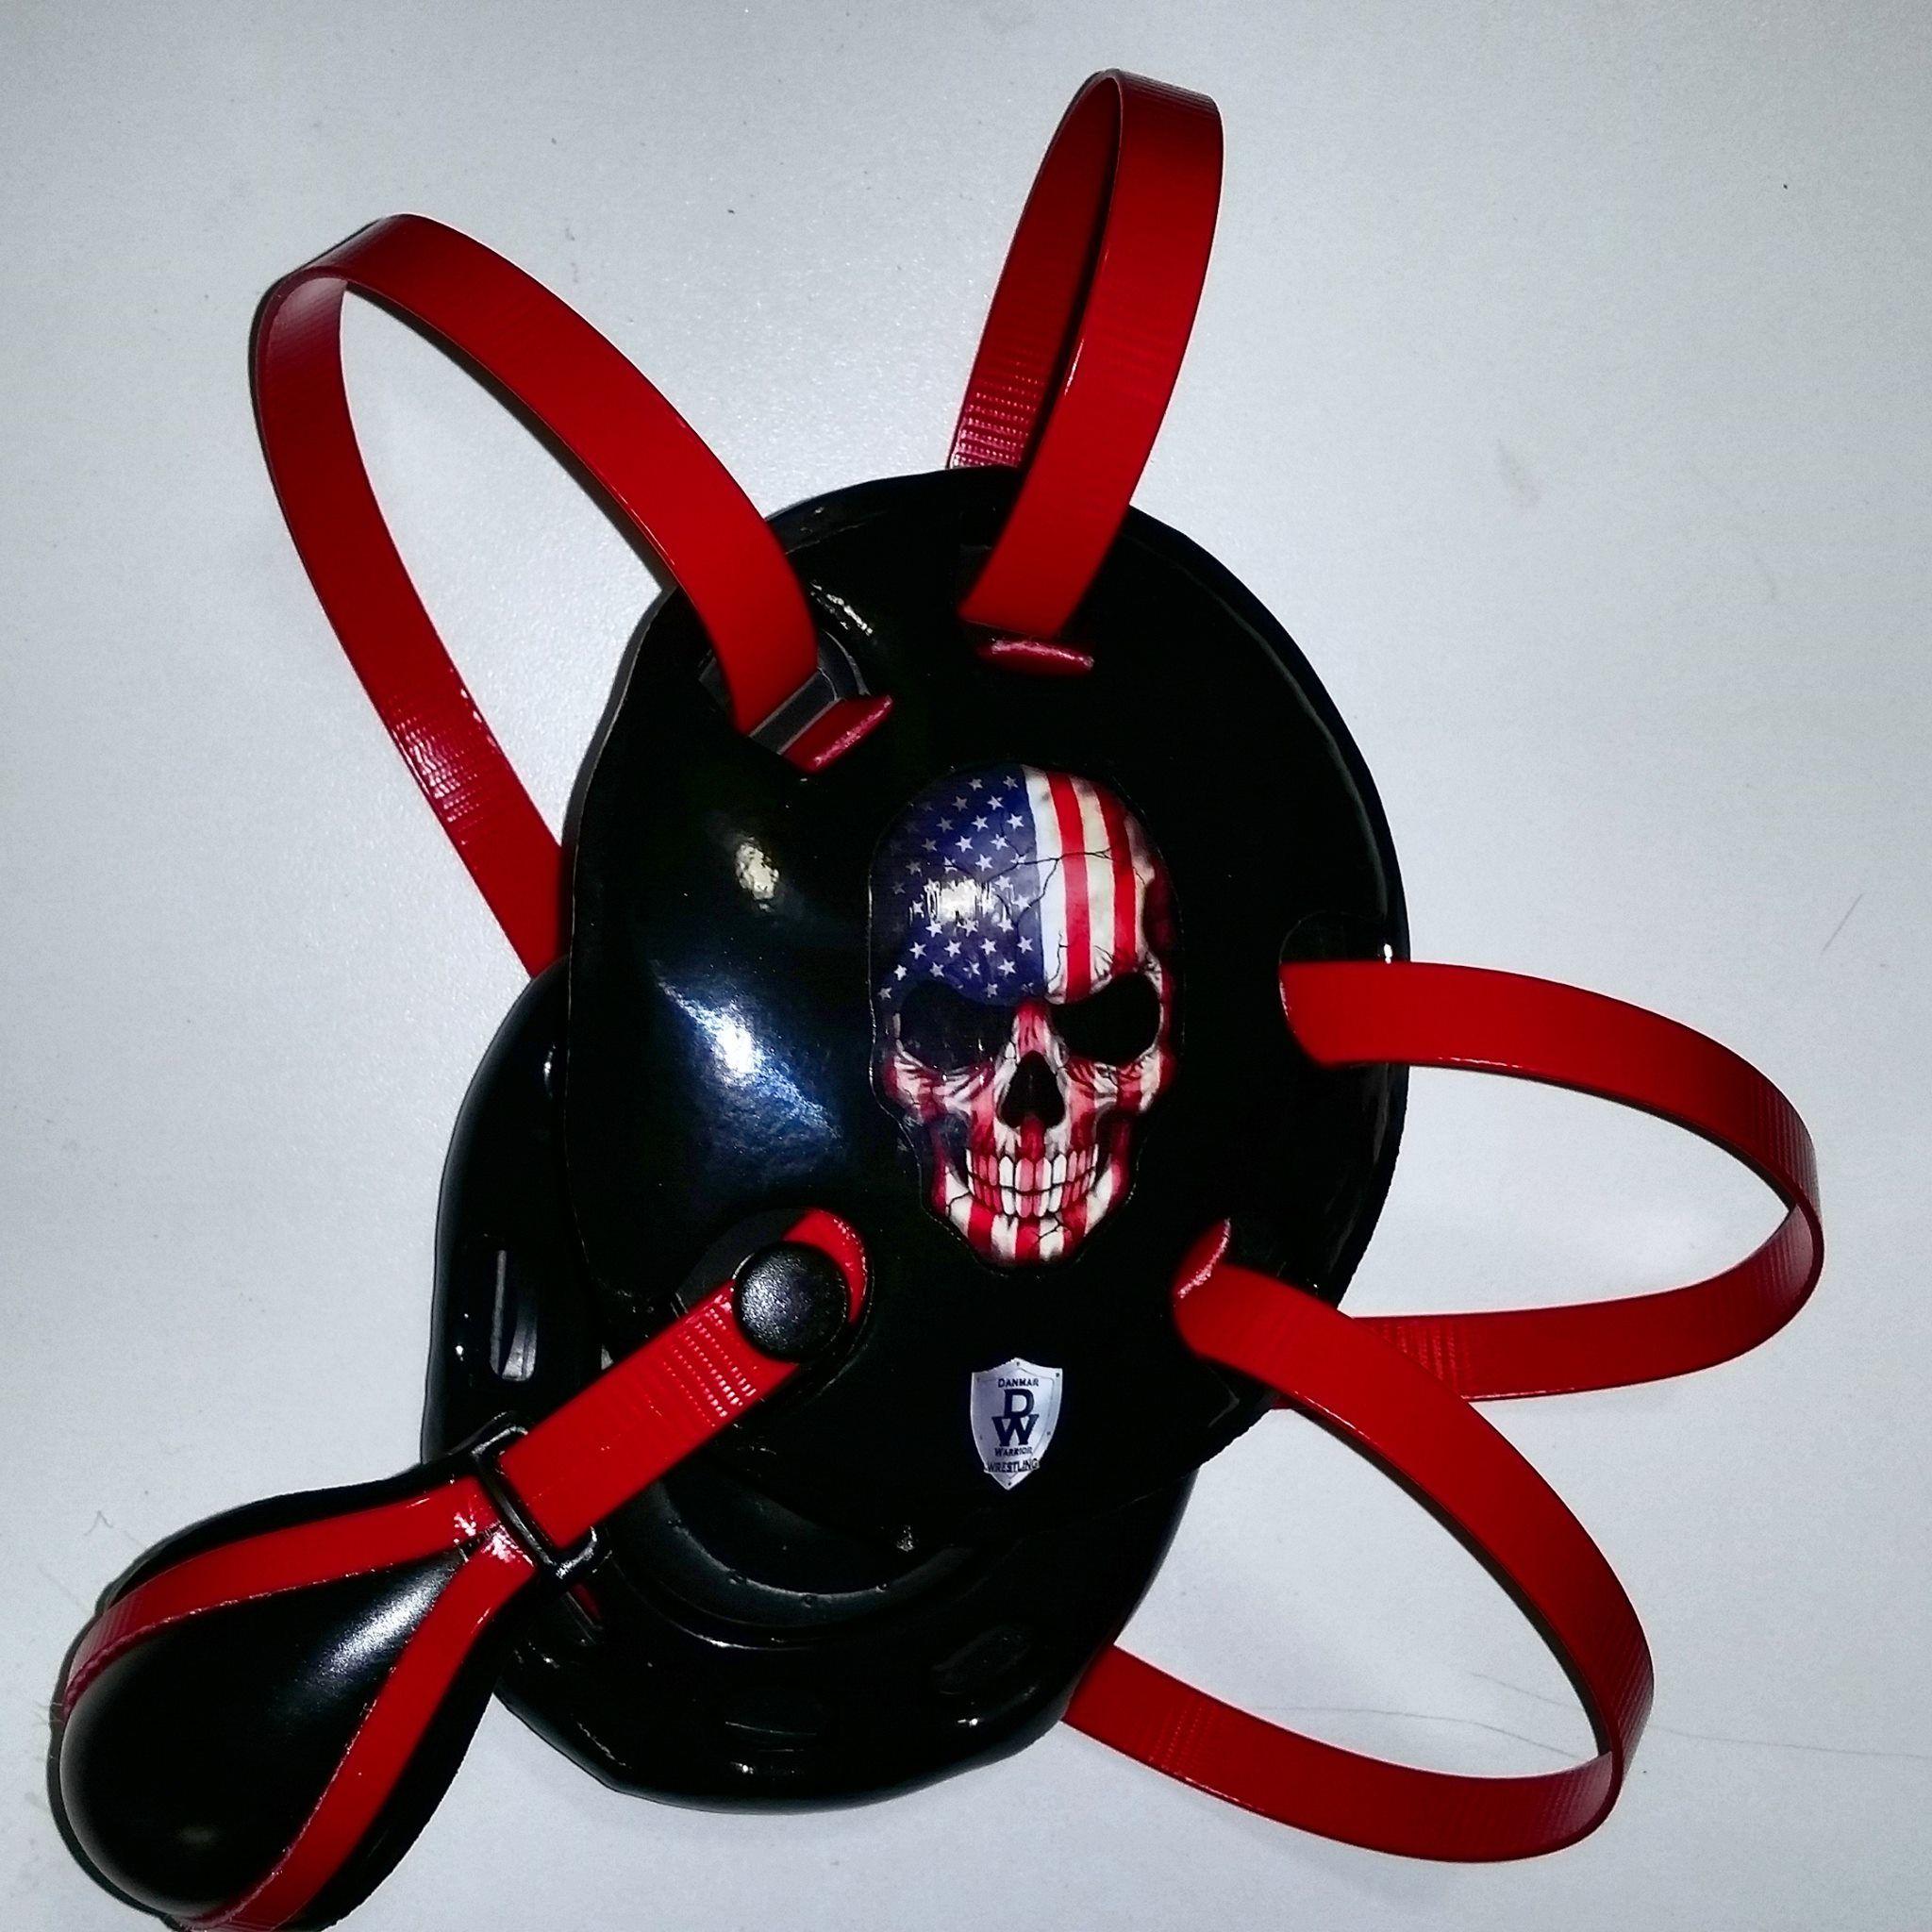 303c97af45 Custom Skull Wrestling Headgear | Wrestling Headgear | Wrestling ...